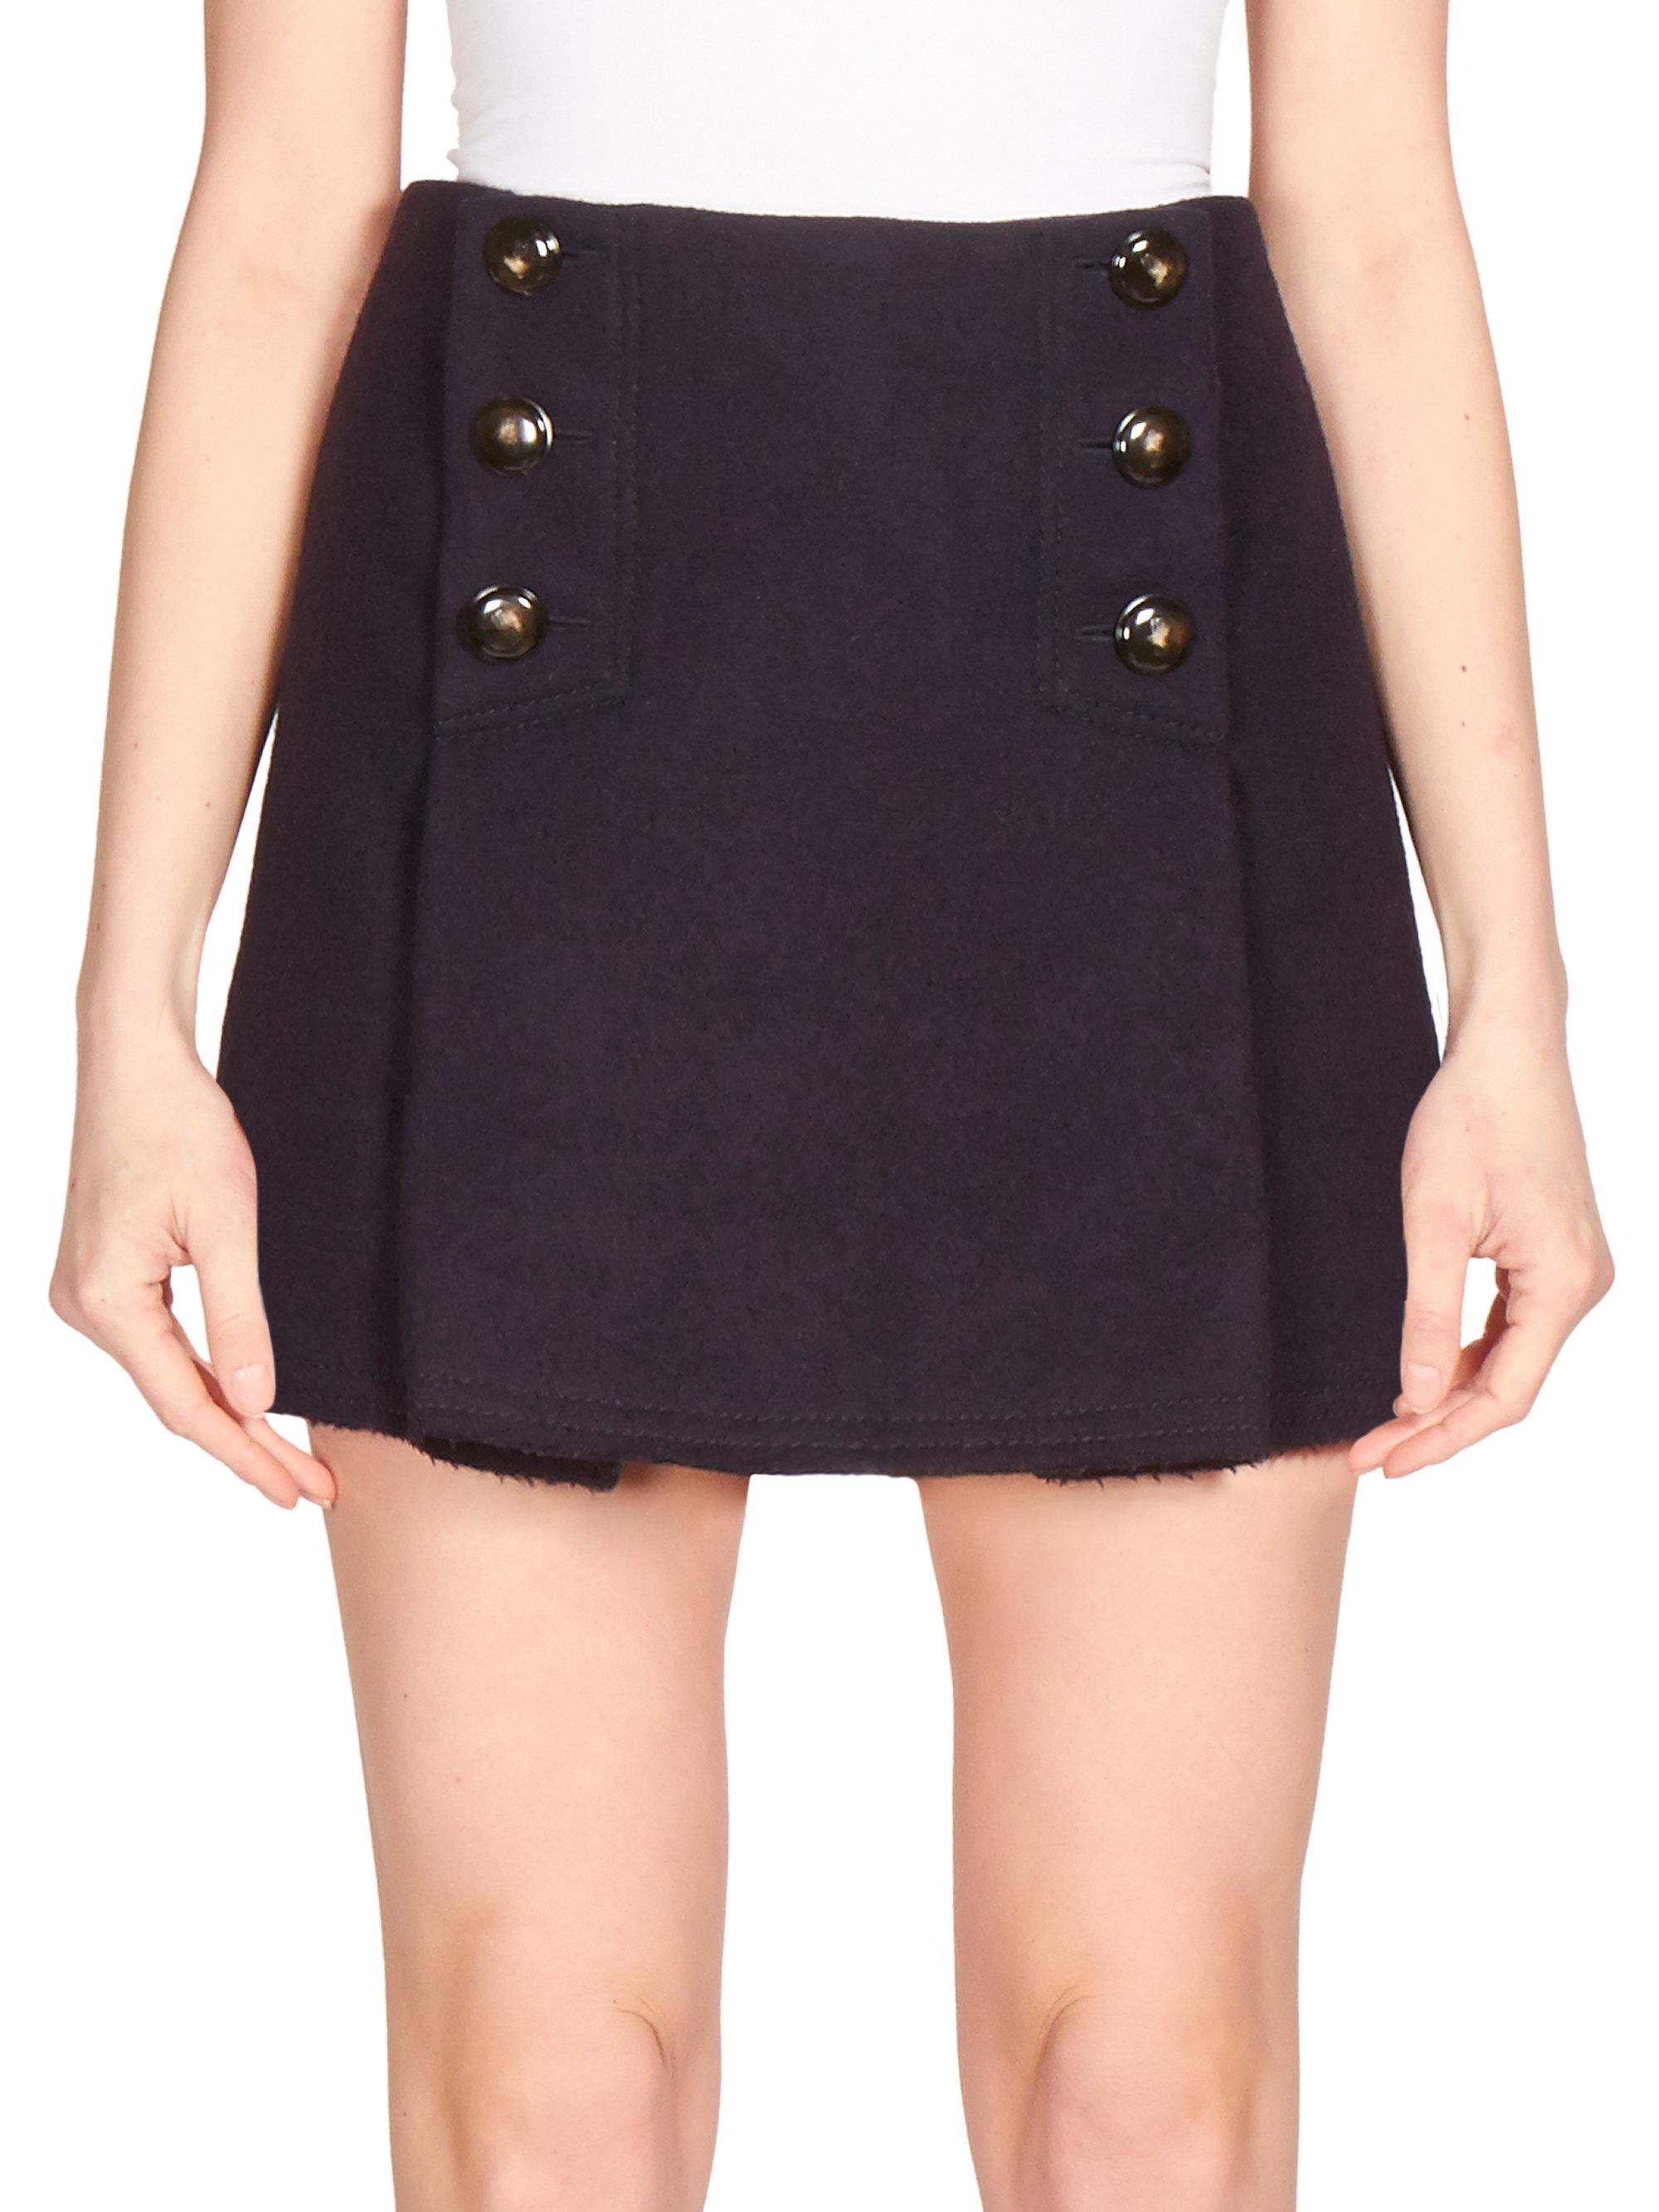 Sonia rykiel Wool Sailor Micro-mini Skirt in Blue | Lyst